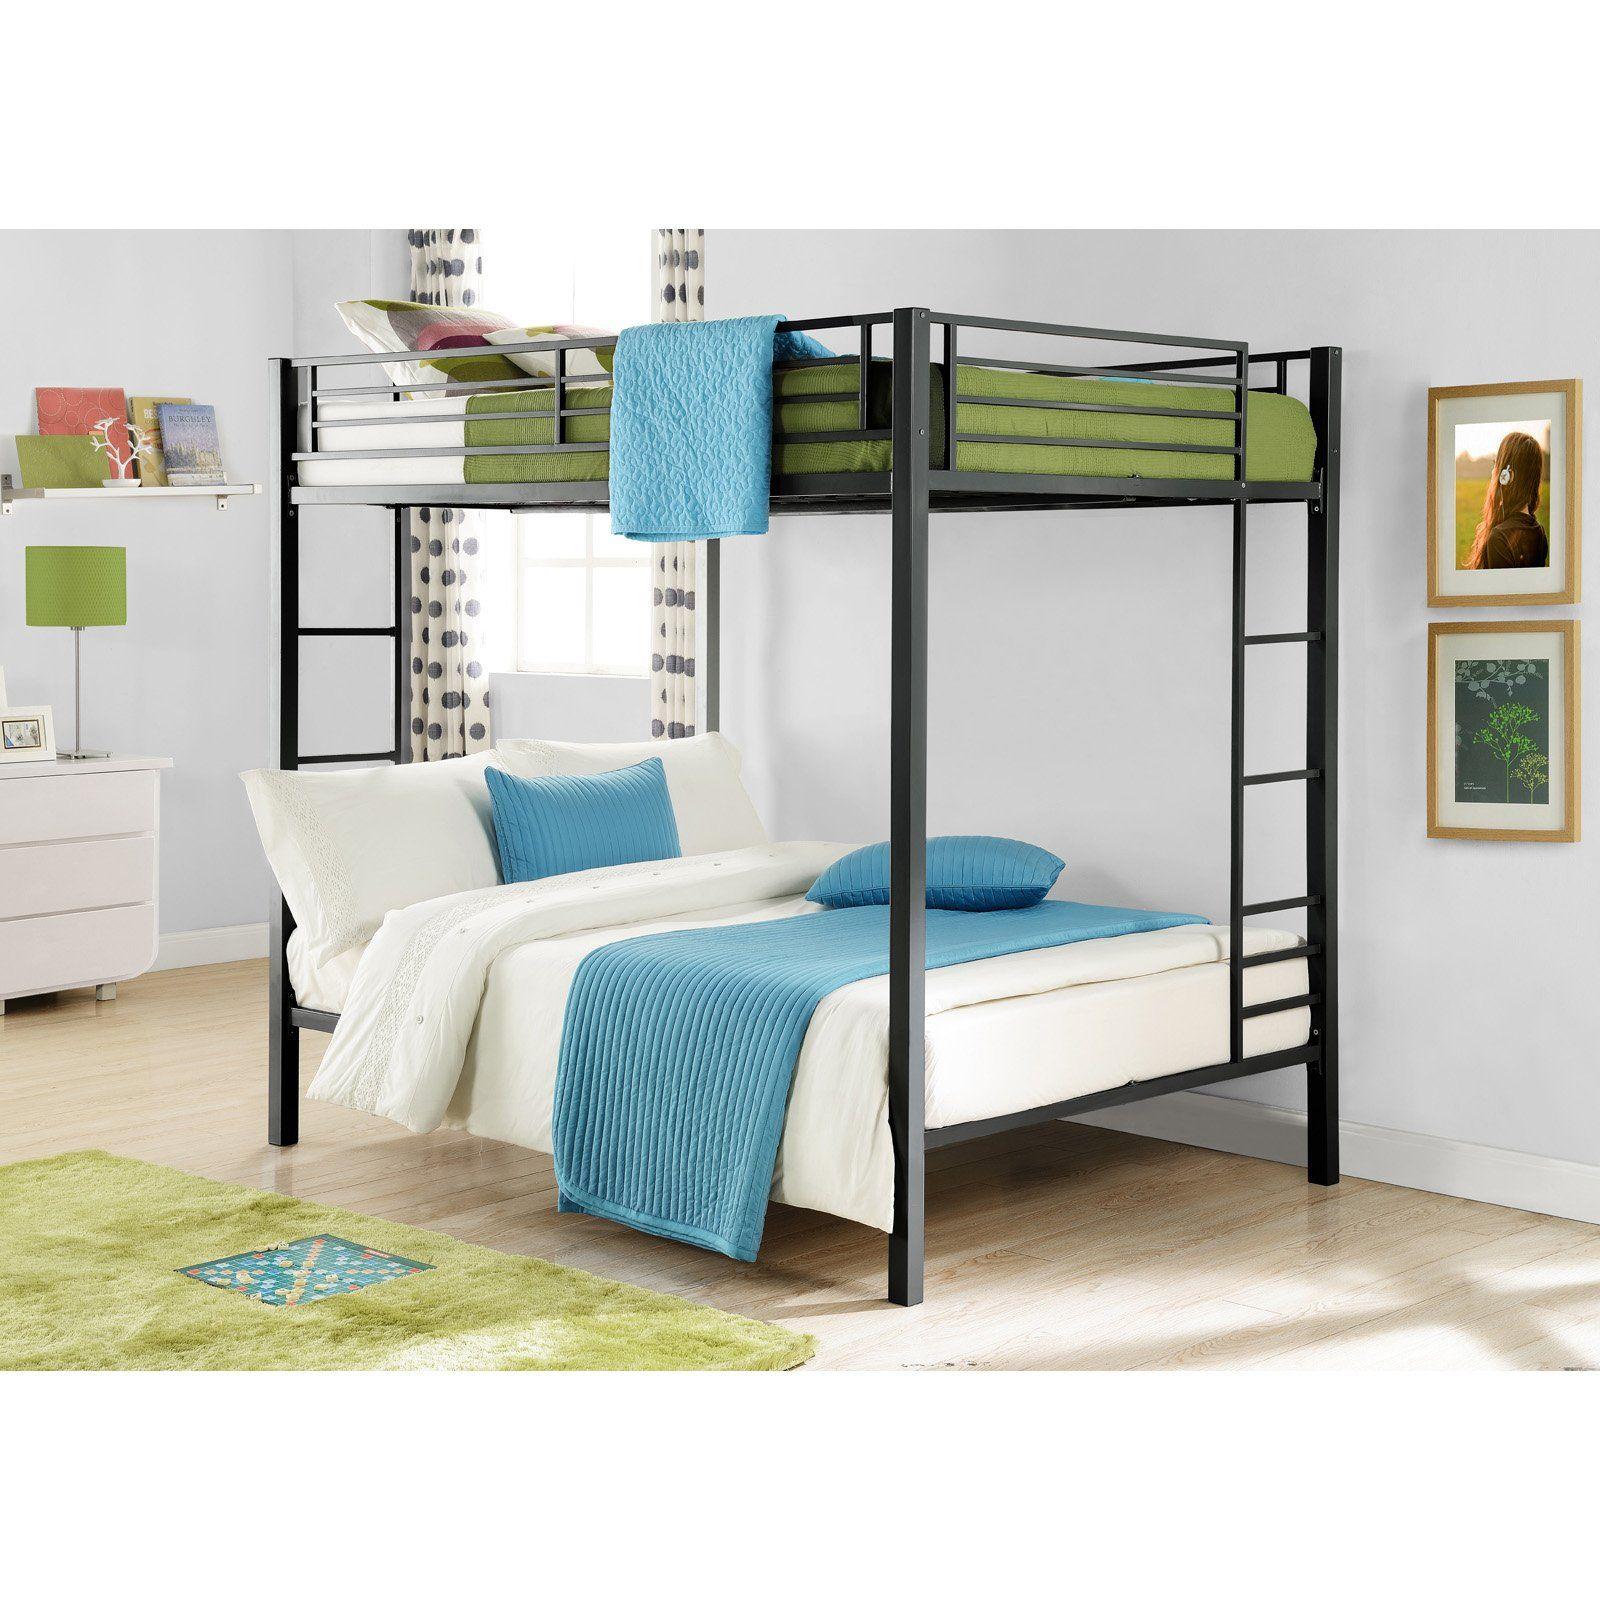 Loft bed ladder ideas  Dorel Home Zurich Full over Full Bunk Bed  hayneedle